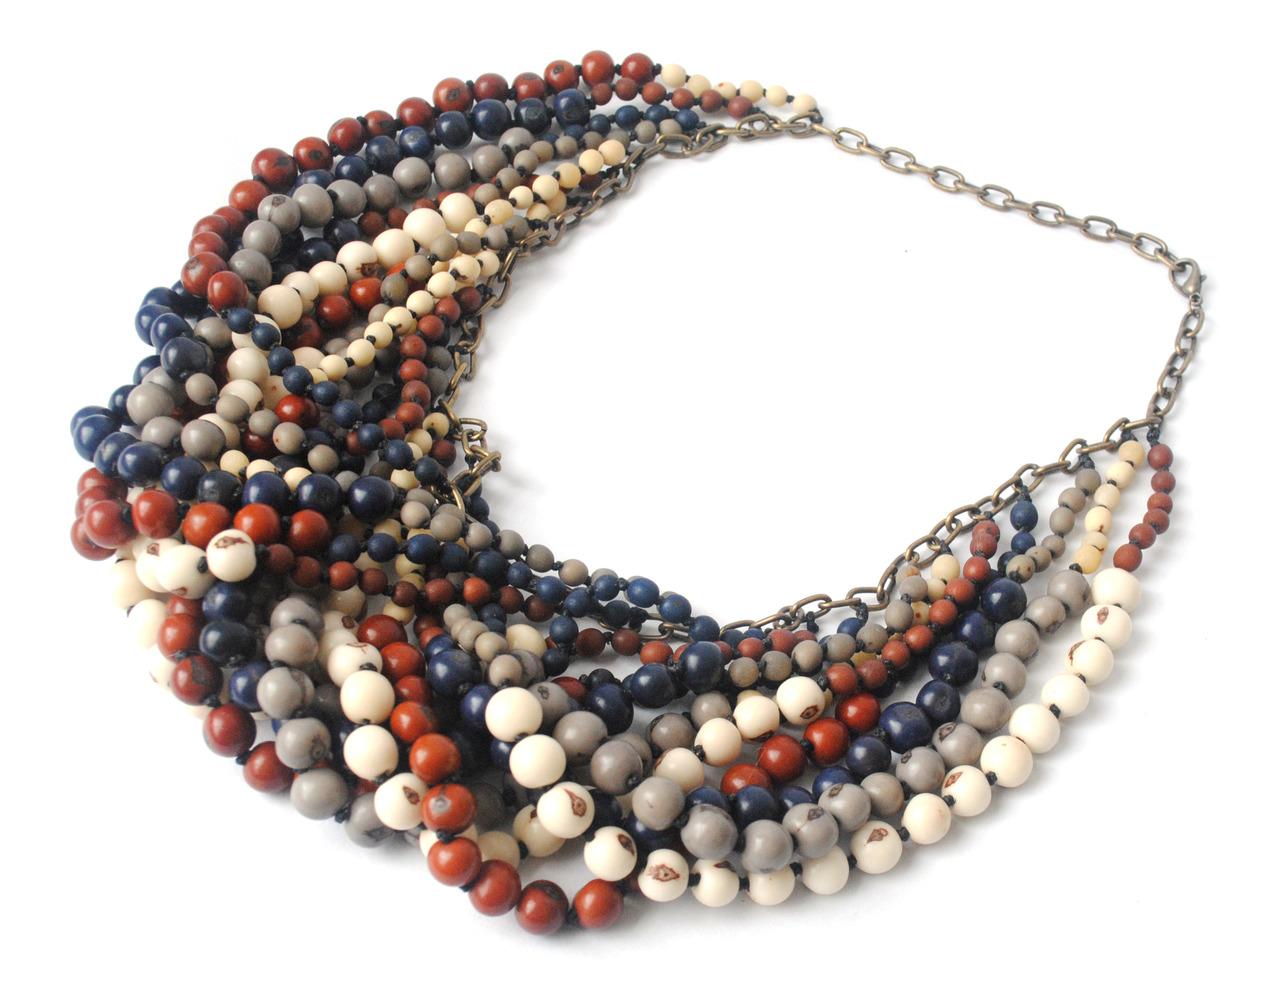 Niagara Necklace –Elegant